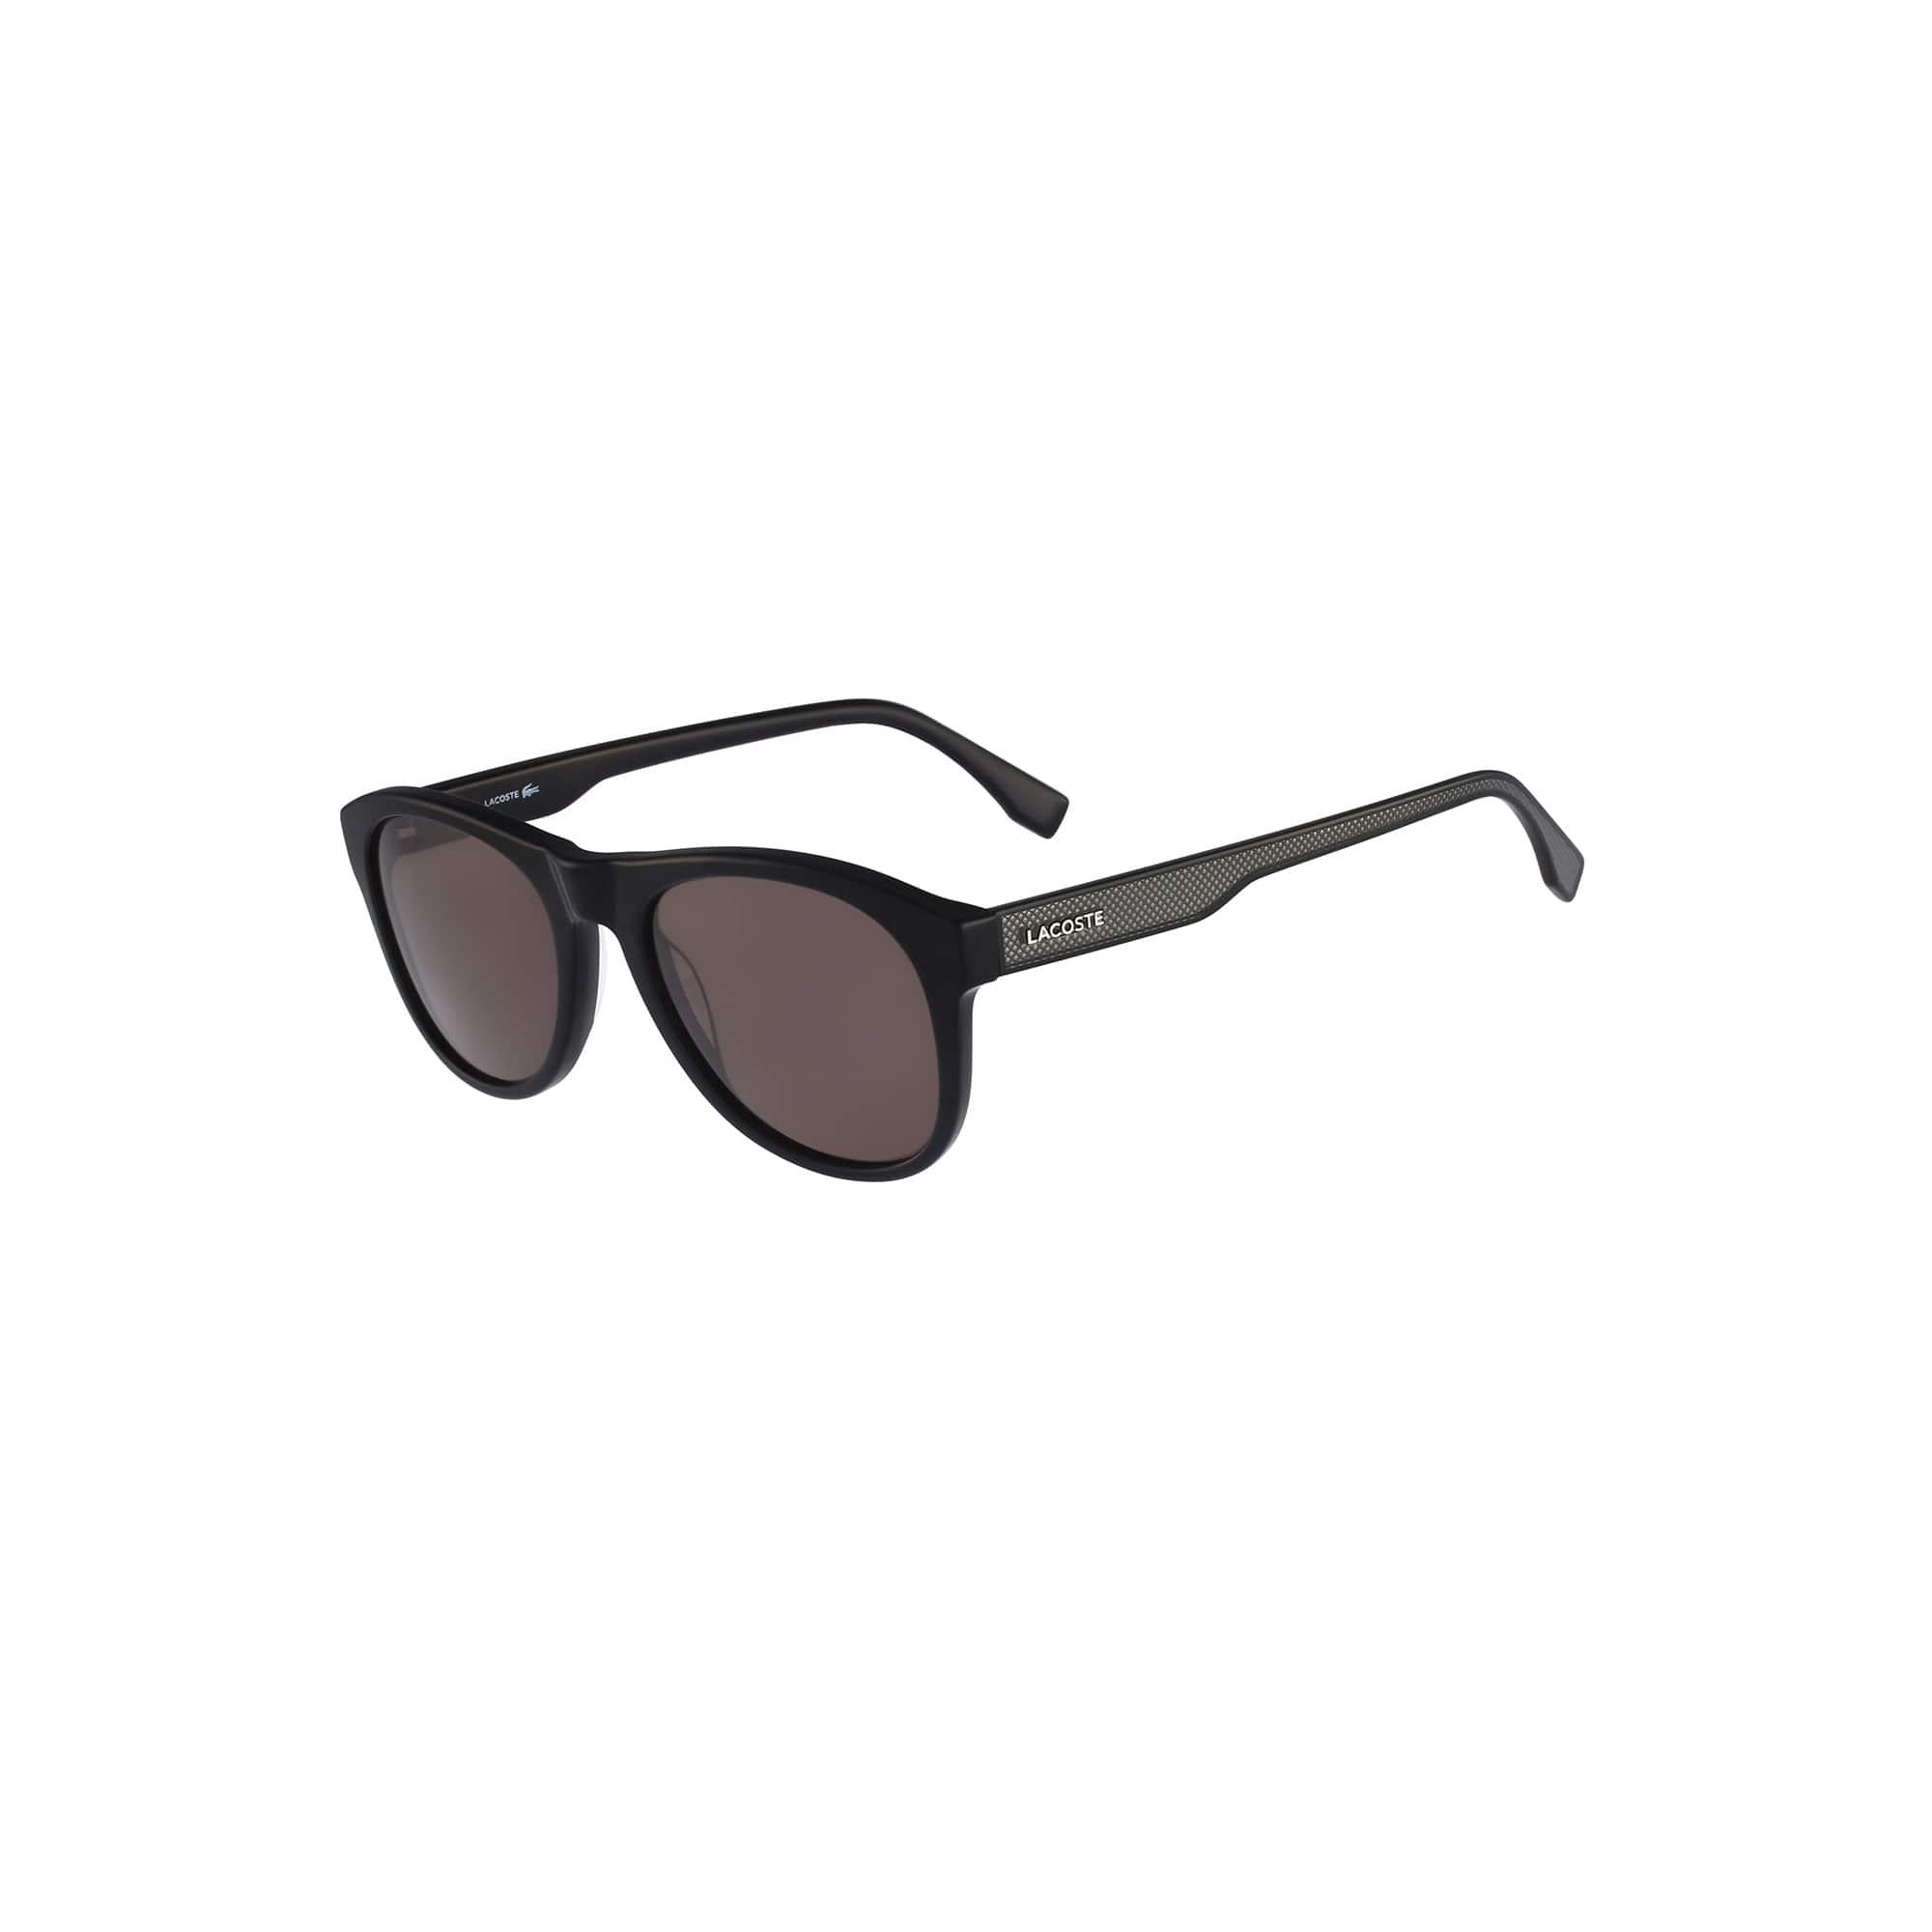 Women's Round Piqué Sunglasses